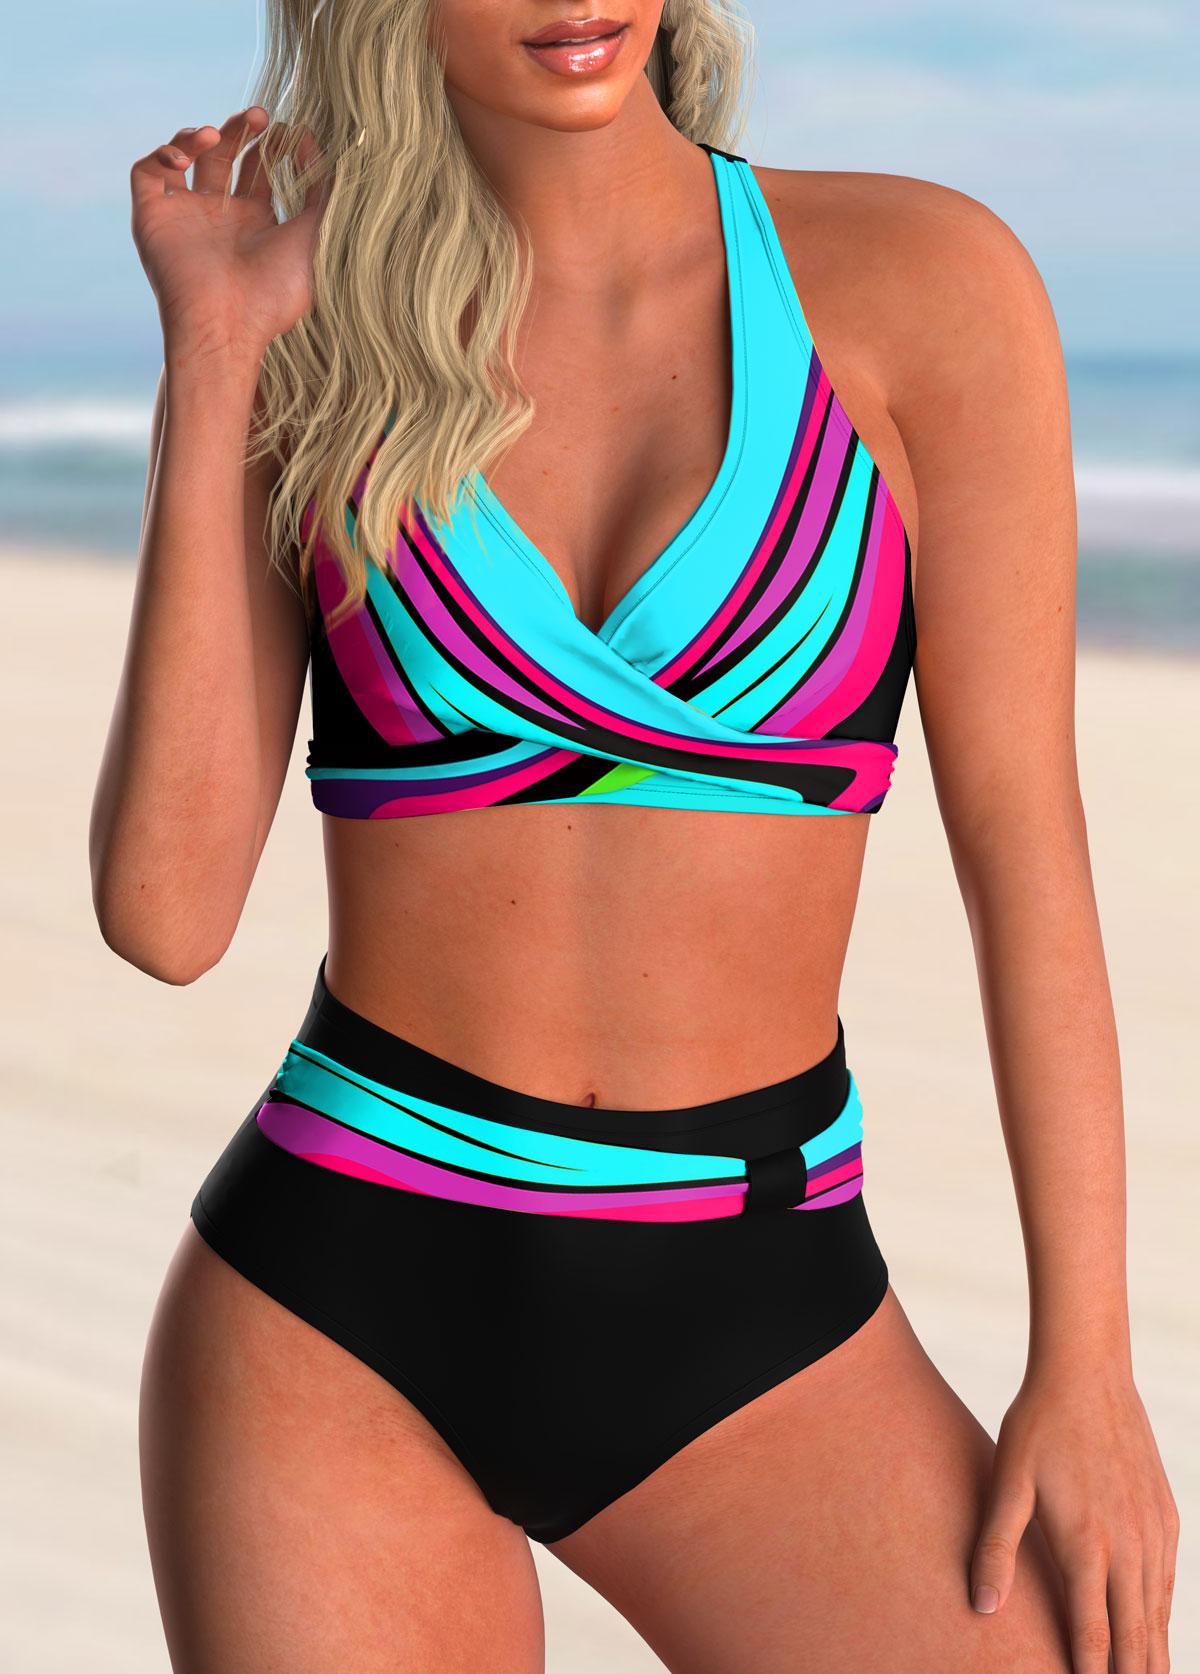 ROTITA Colorful Printed Cross Front High Waisted Bikini Set